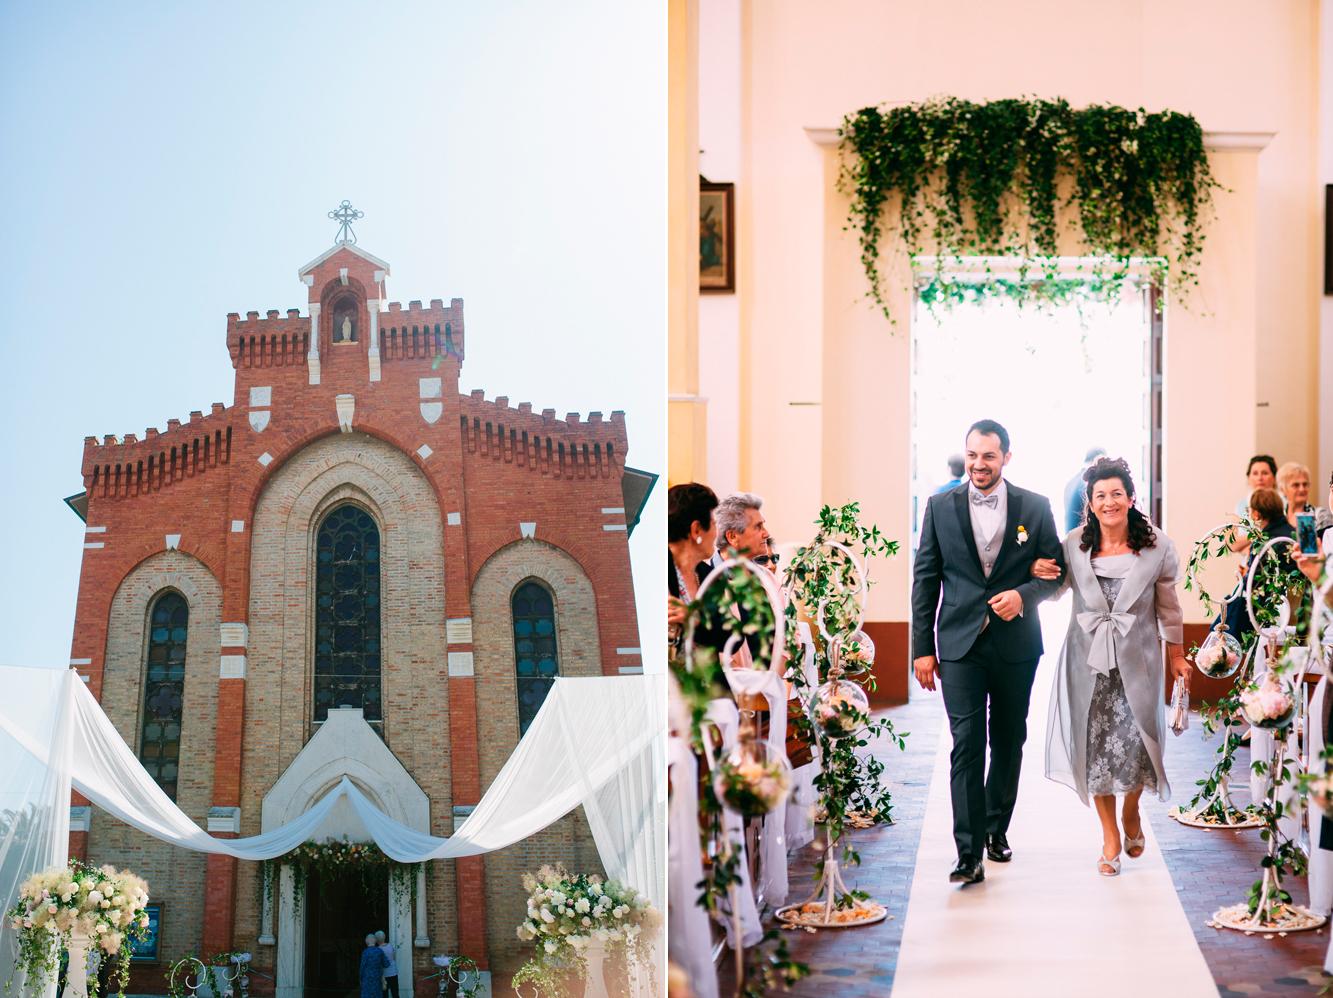 081-chiesa sant' anna matrimonio church porto potenza wedding.jpg